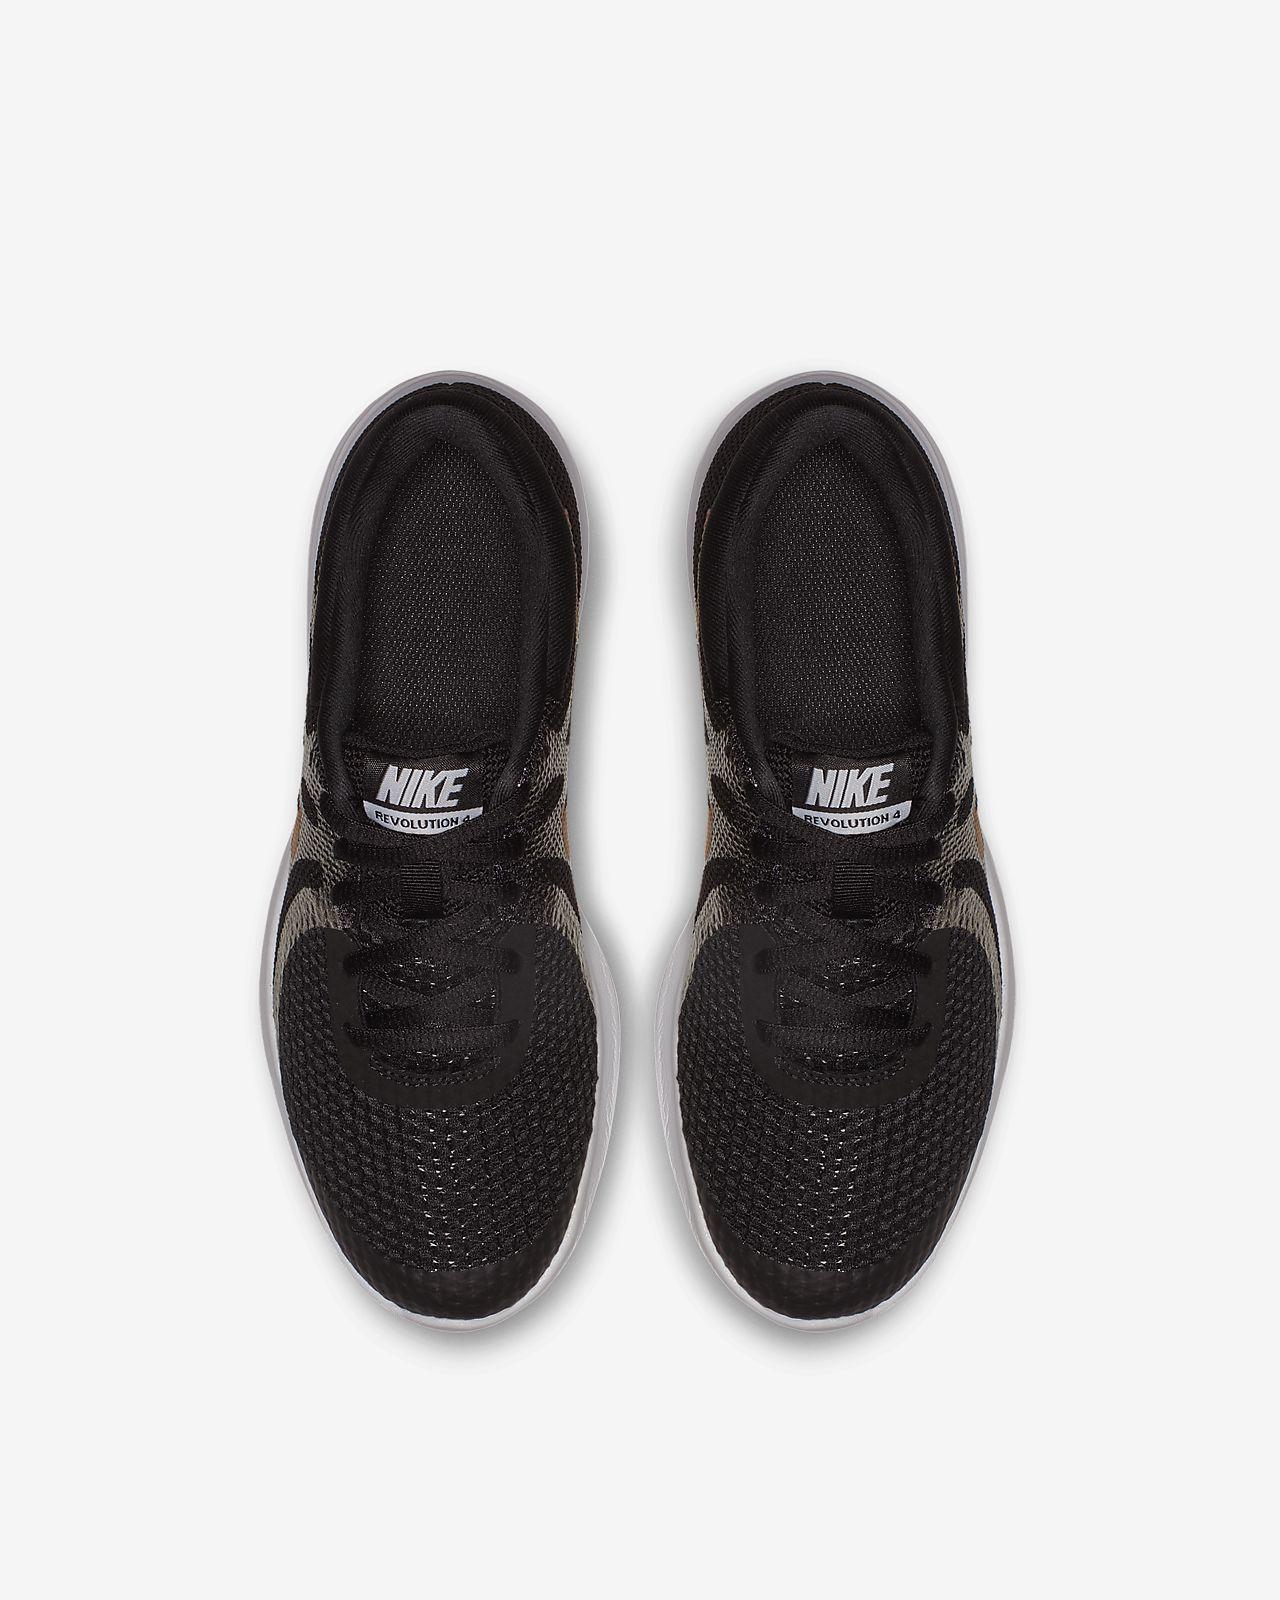 b640abf6f0d Nike Revolution 4 Shield Older Kids  Running Shoe. Nike.com CA